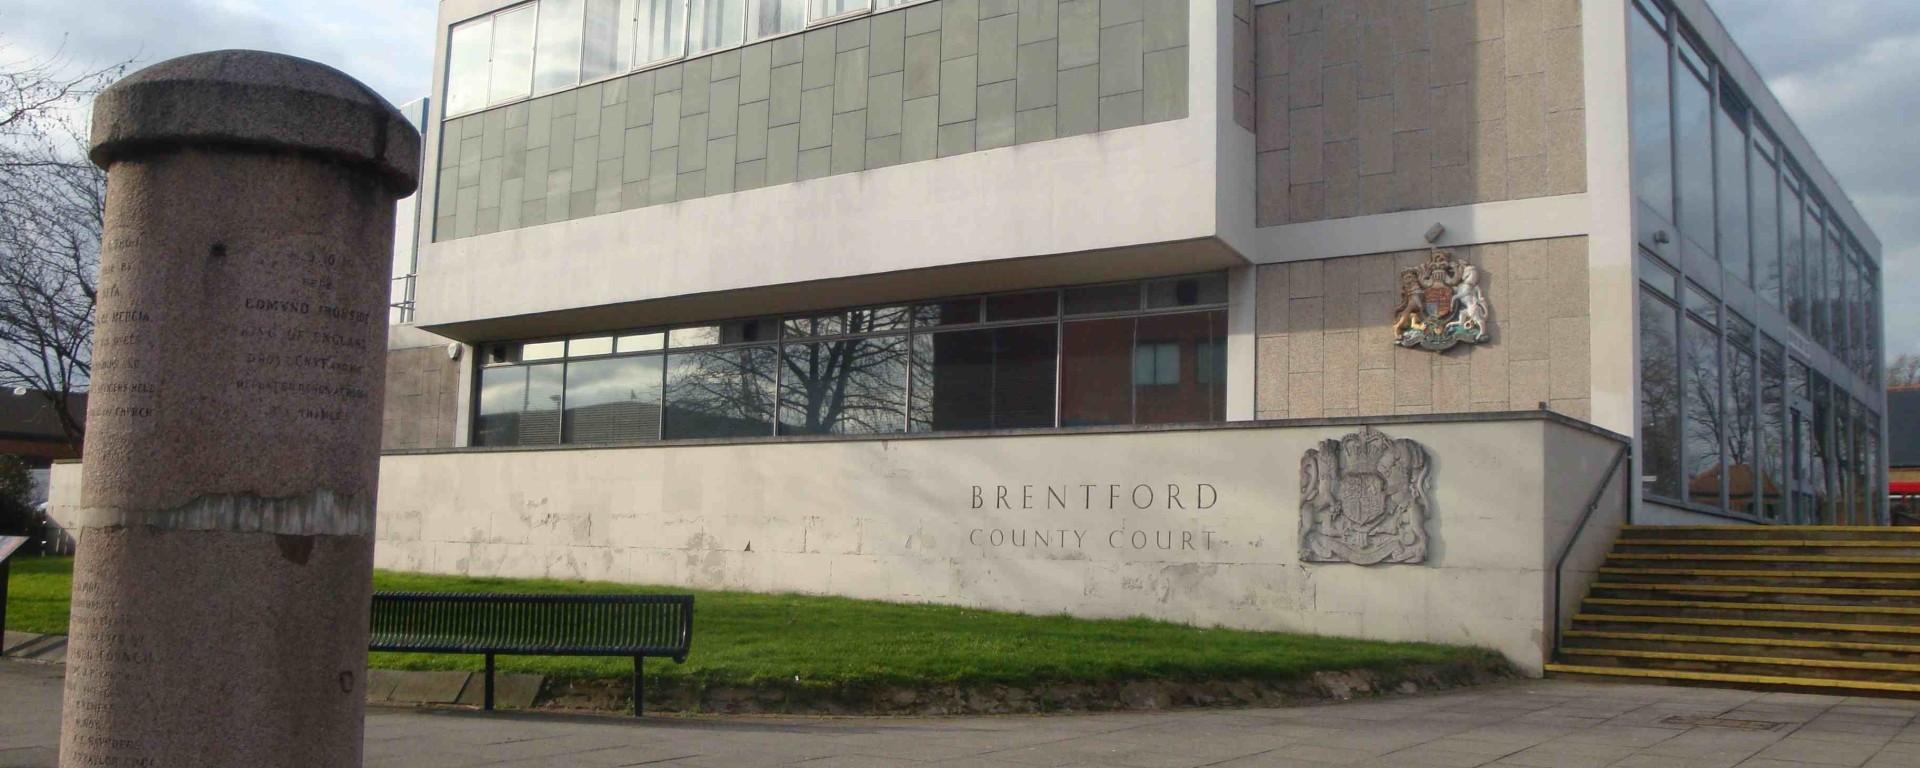 Brentford County Court